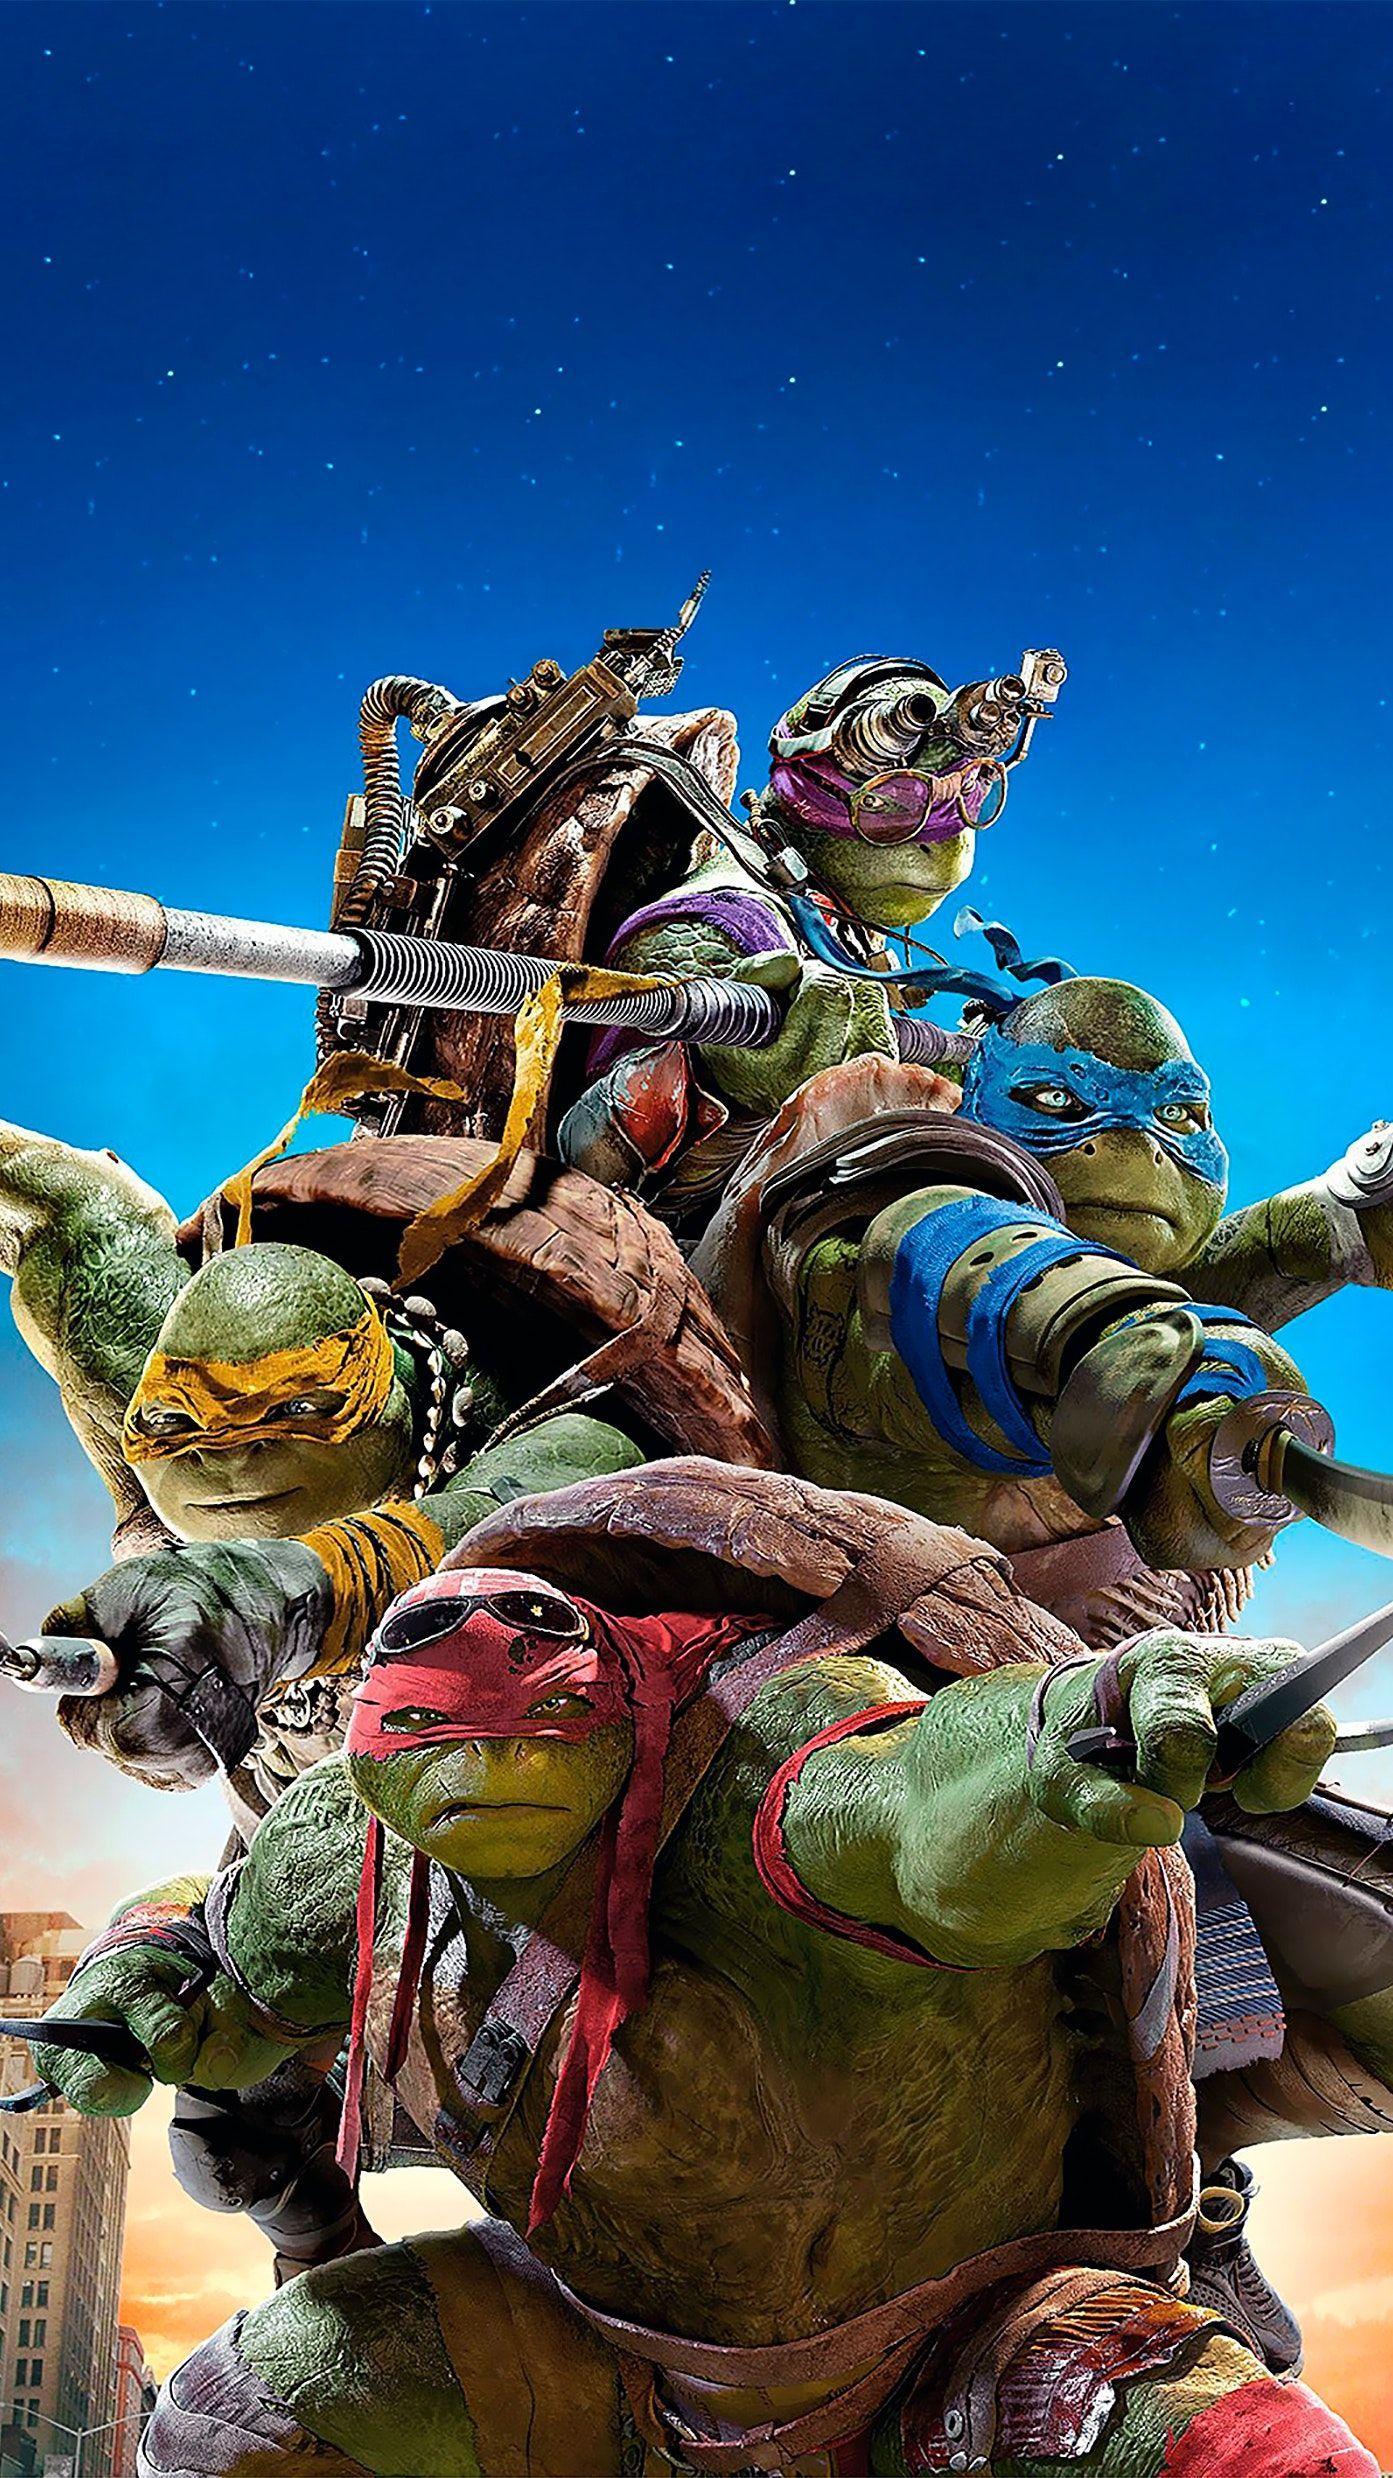 Teenage Mutant Ninja Turtles Movies Wallpapers - Wallpaper ...